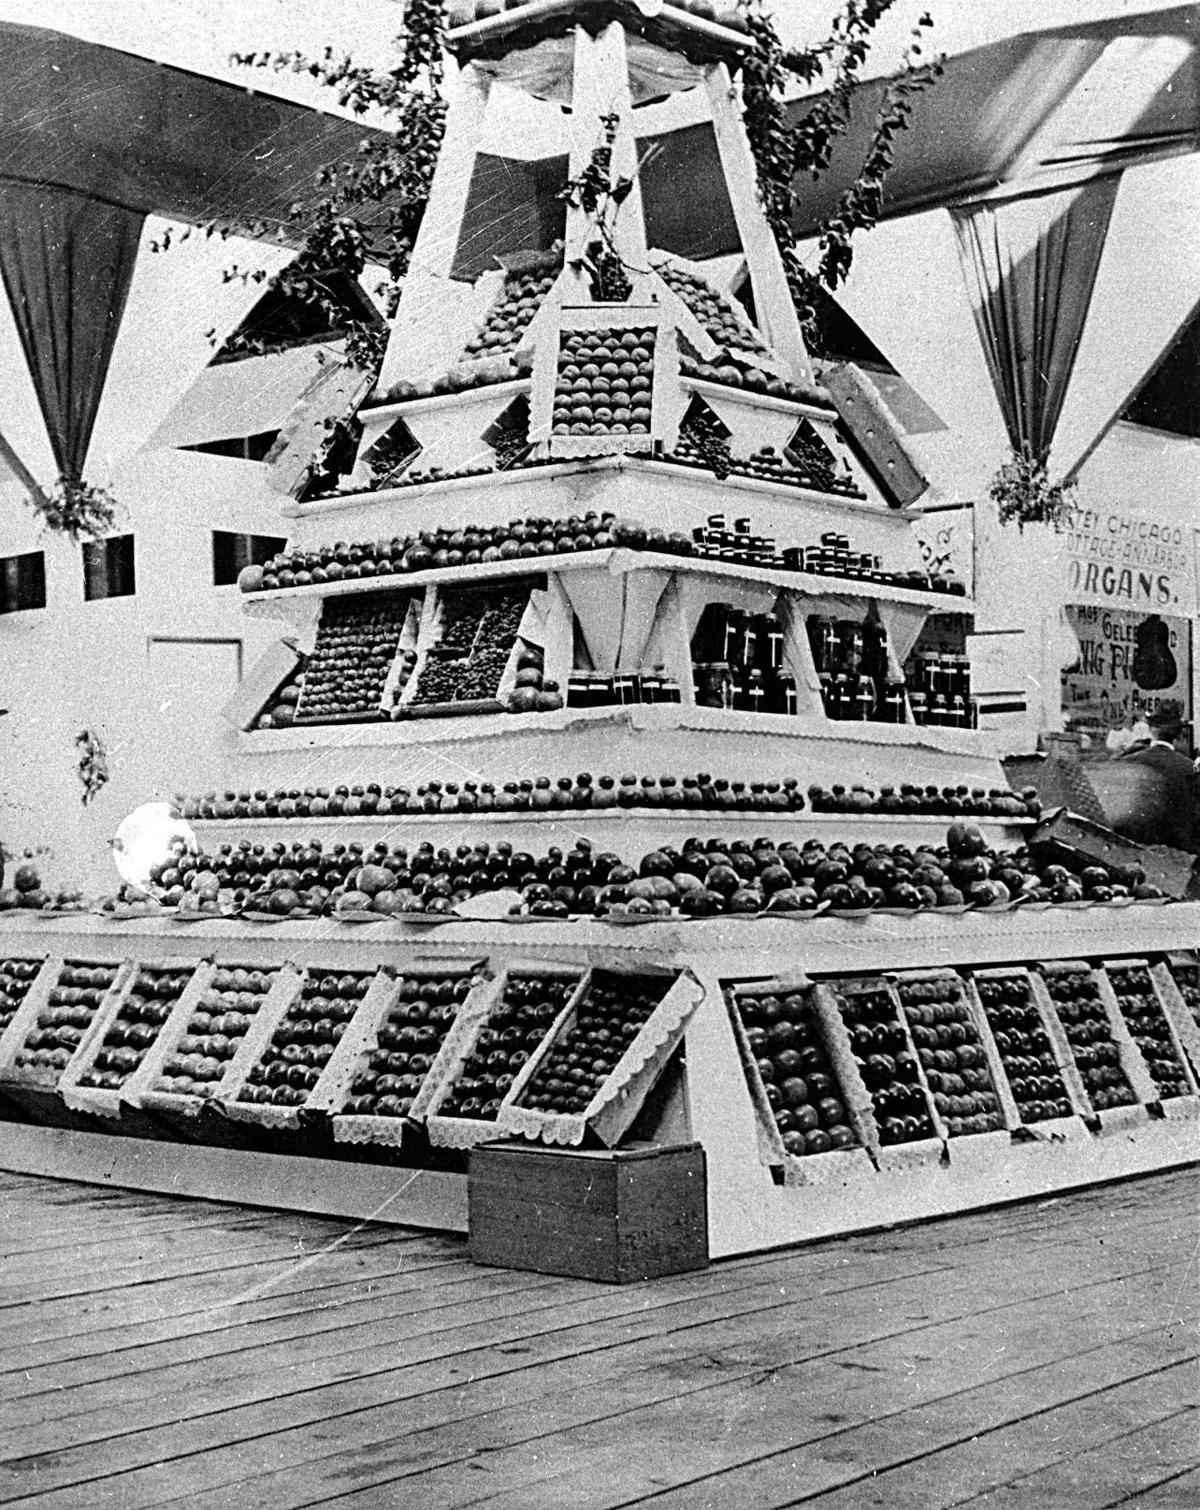 pyramid of apples